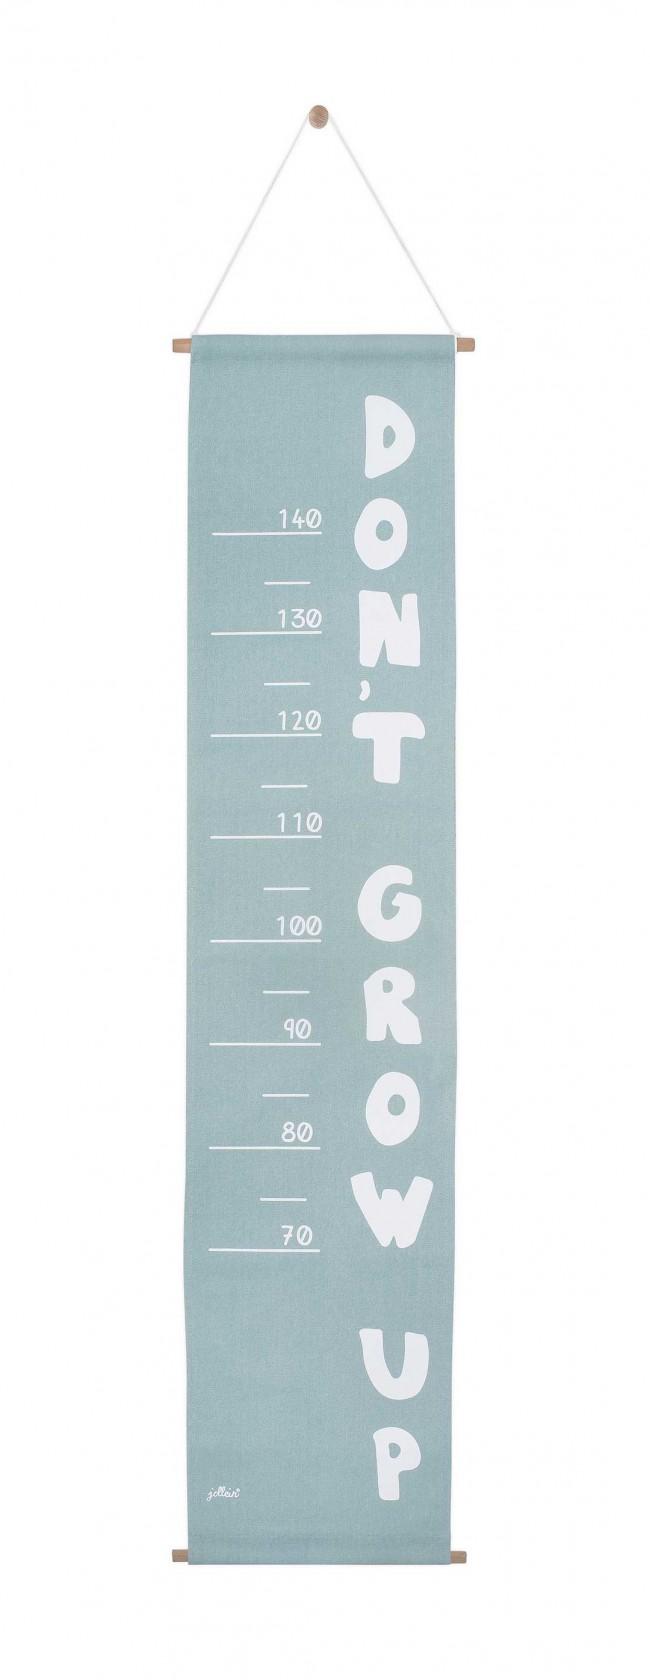 Messlatte Stoff ABC stonegreen 70 - 140 cm